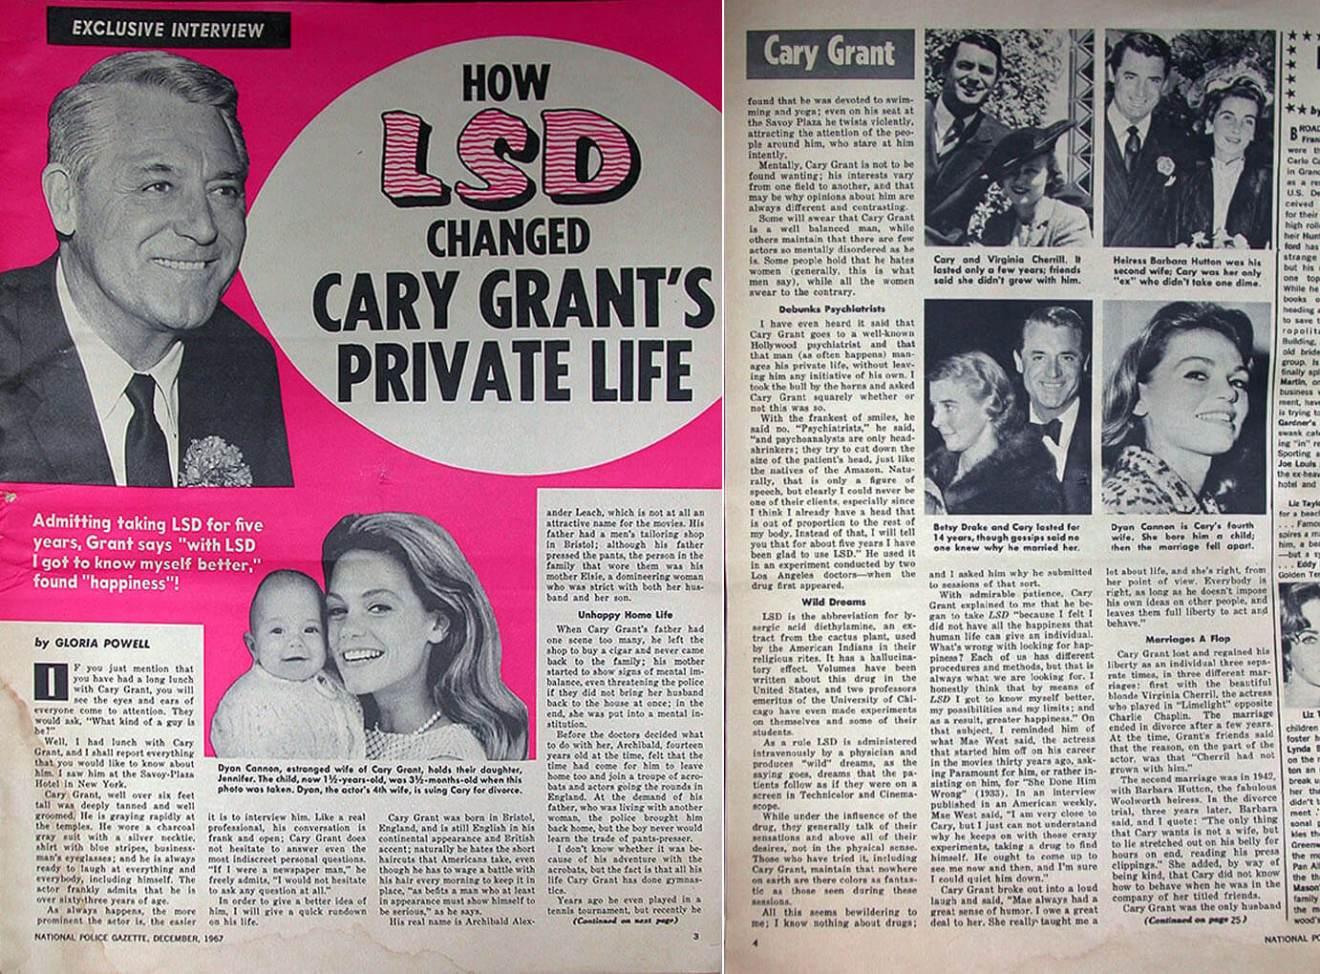 Cary Grant opowiada prasie oLSD